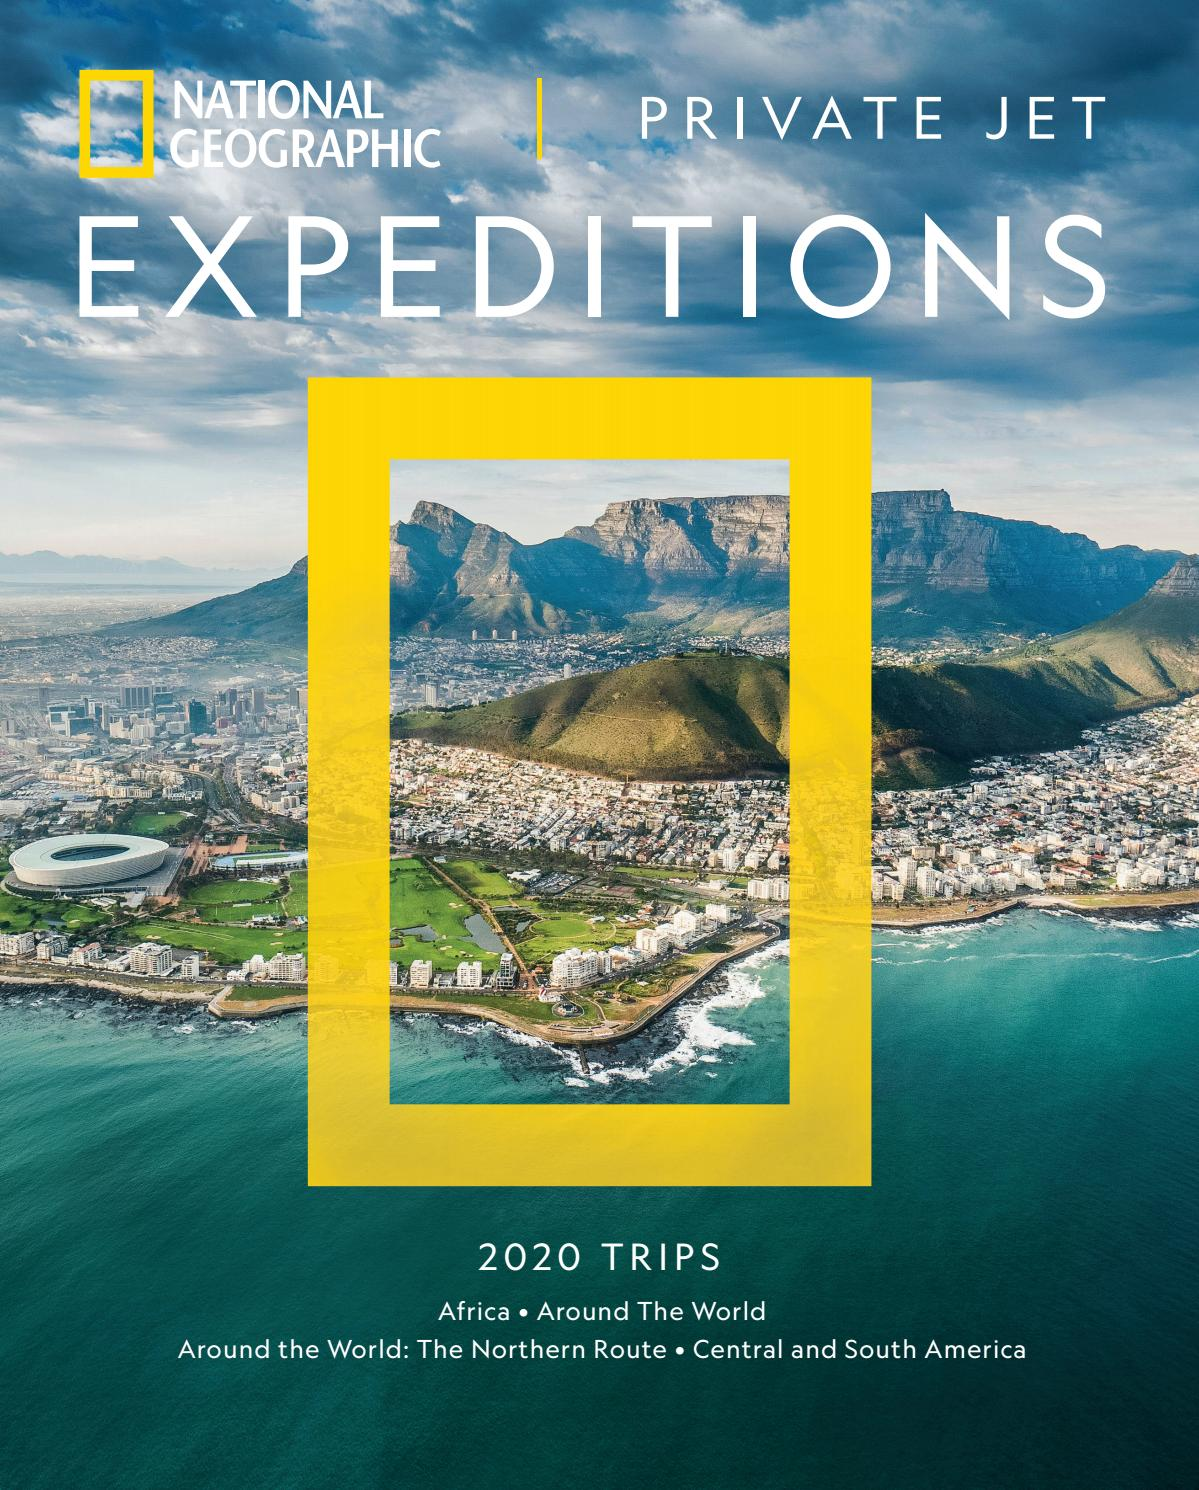 Resultado de imagen para Nat Geo Expeditions route central and South America 2020